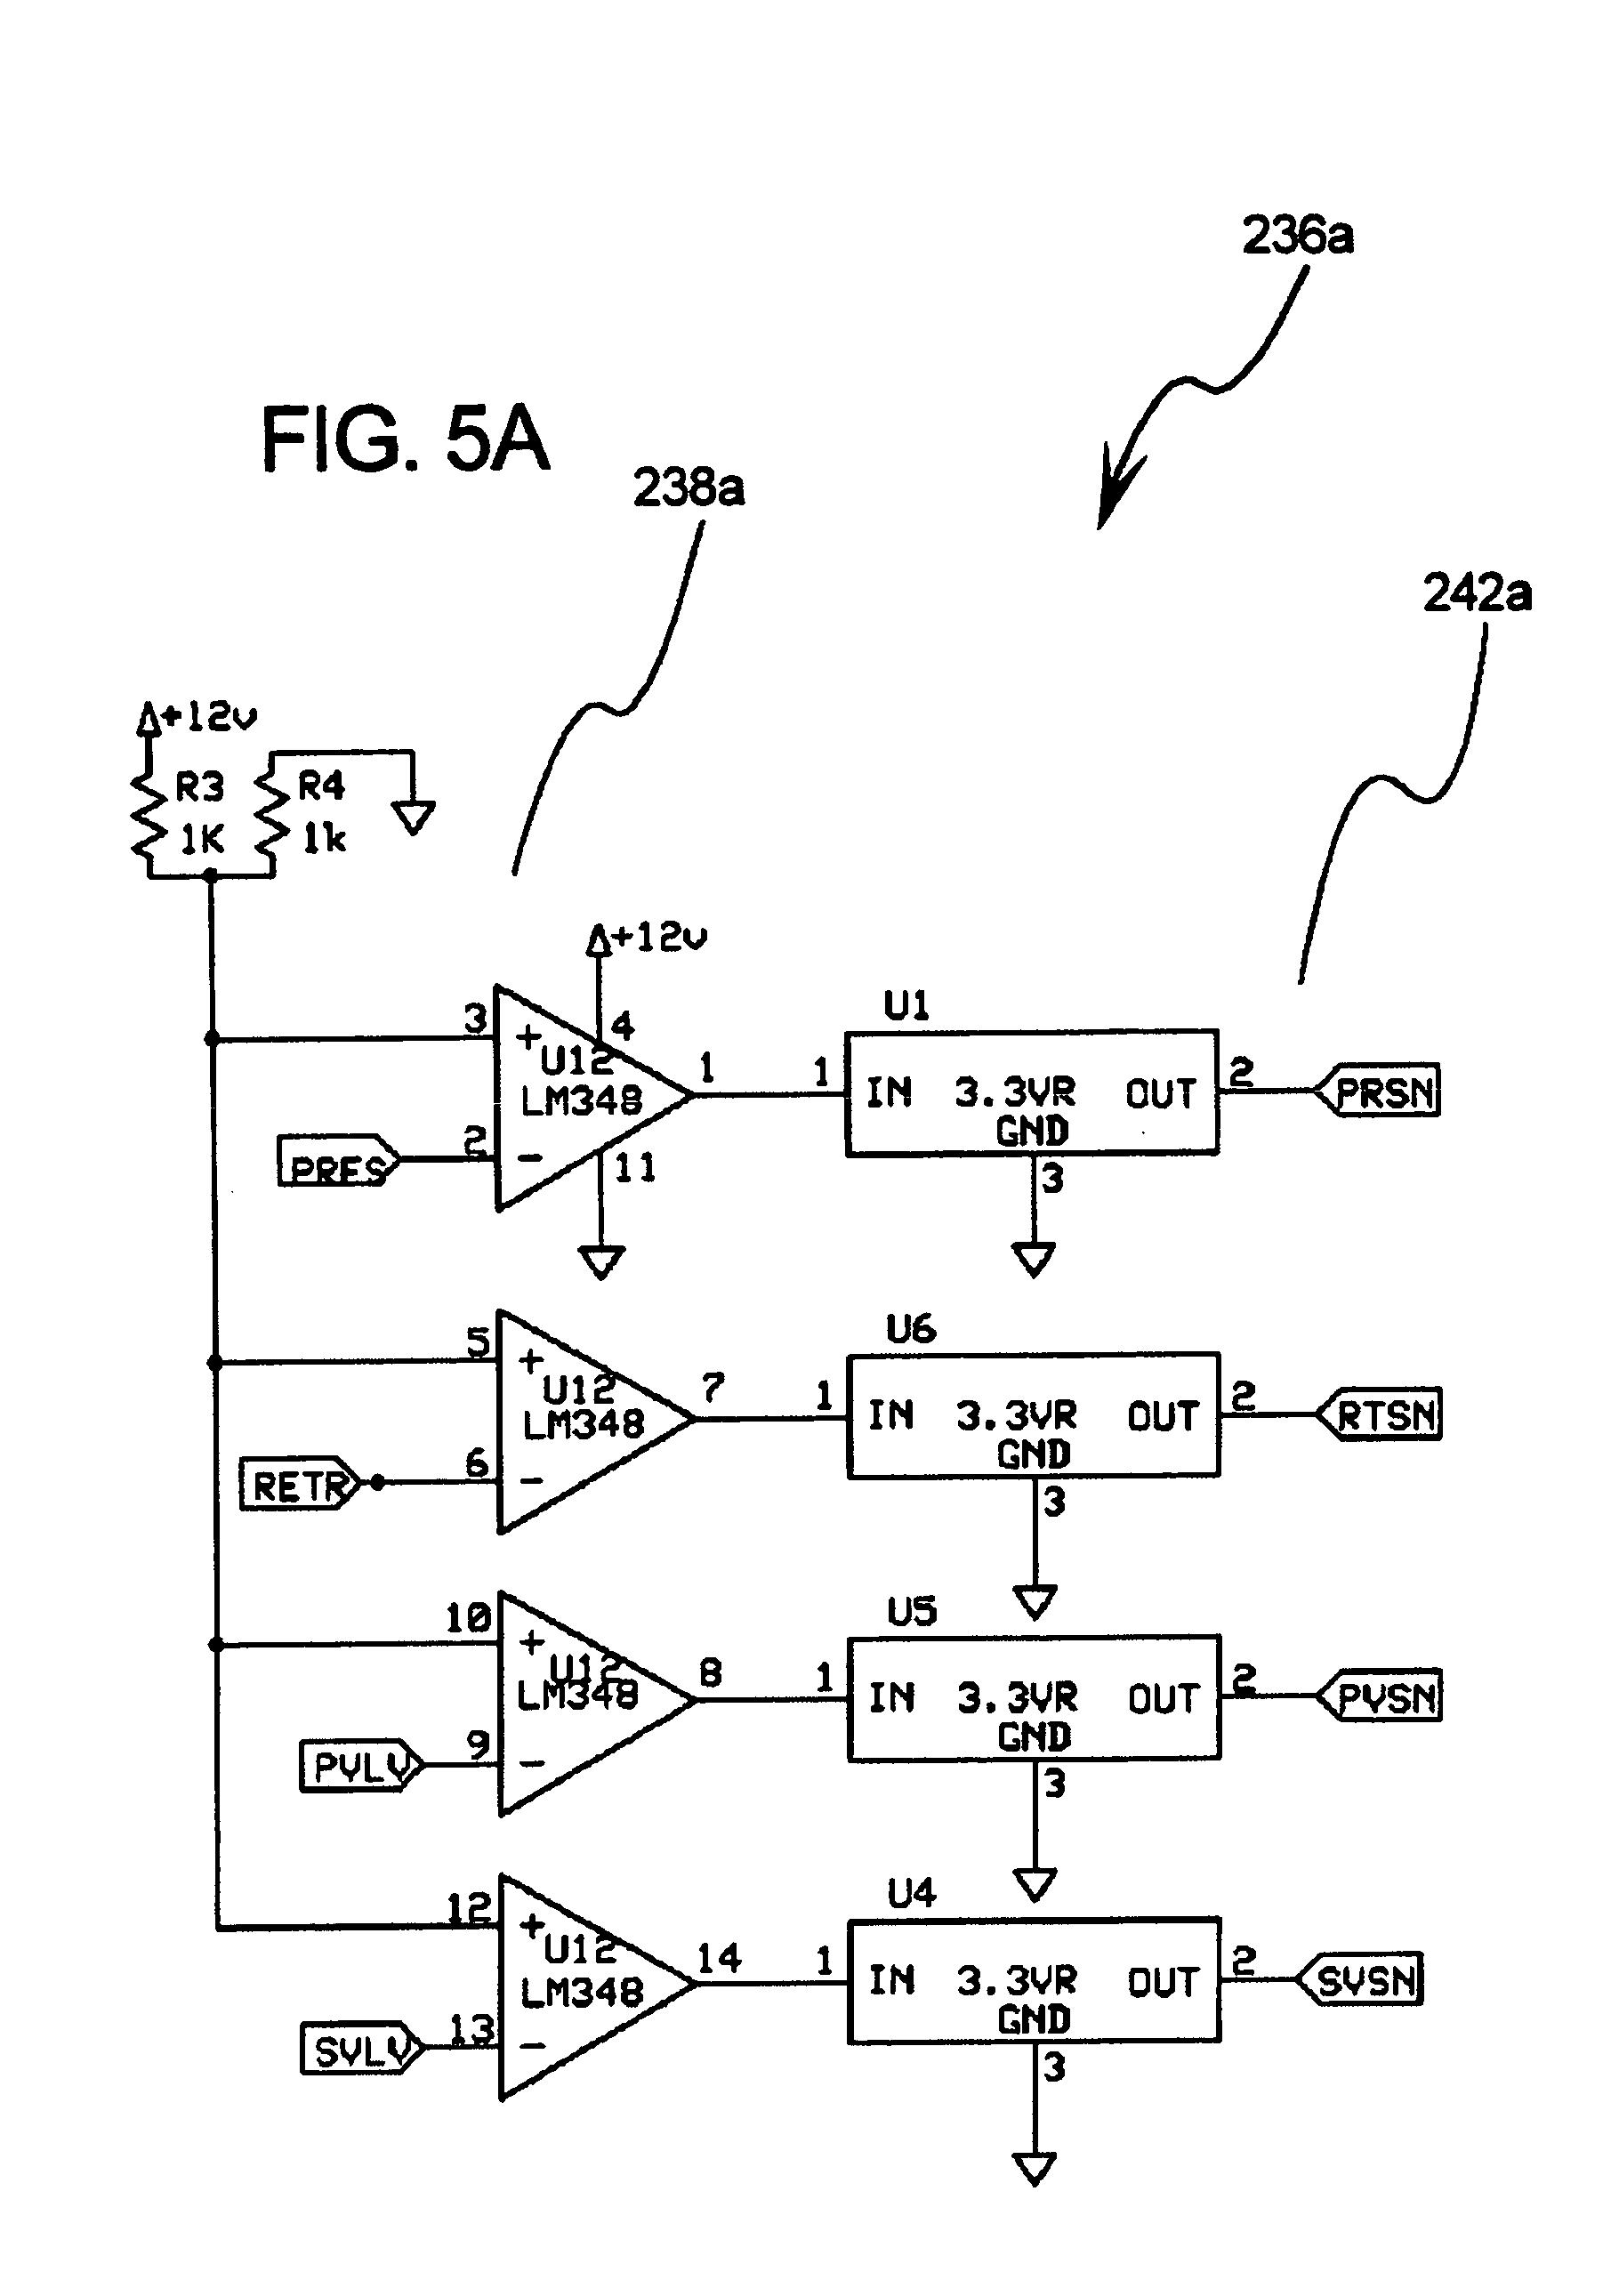 Bennett Trim Tab Wiring Diagram Kanvamath Org Hydraulic Tabs Free Download Diagrams Pump